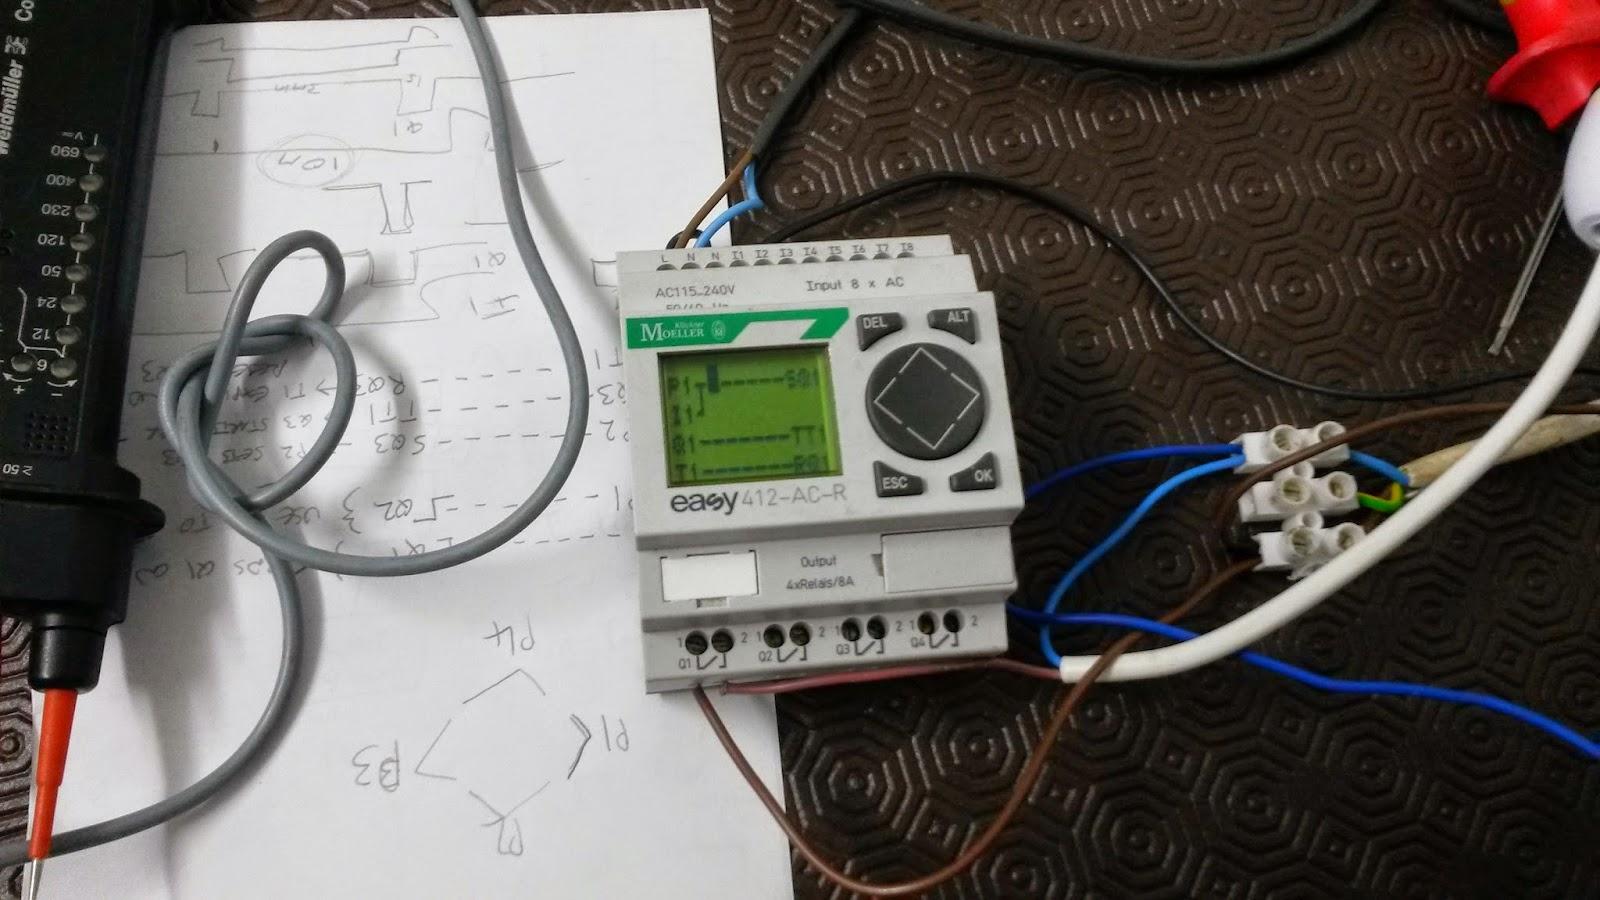 Paul U0026 39 S Geek Dad Blog  Watering System Using Moeller  U0026quot Easy U0026quot  Programmable Relay